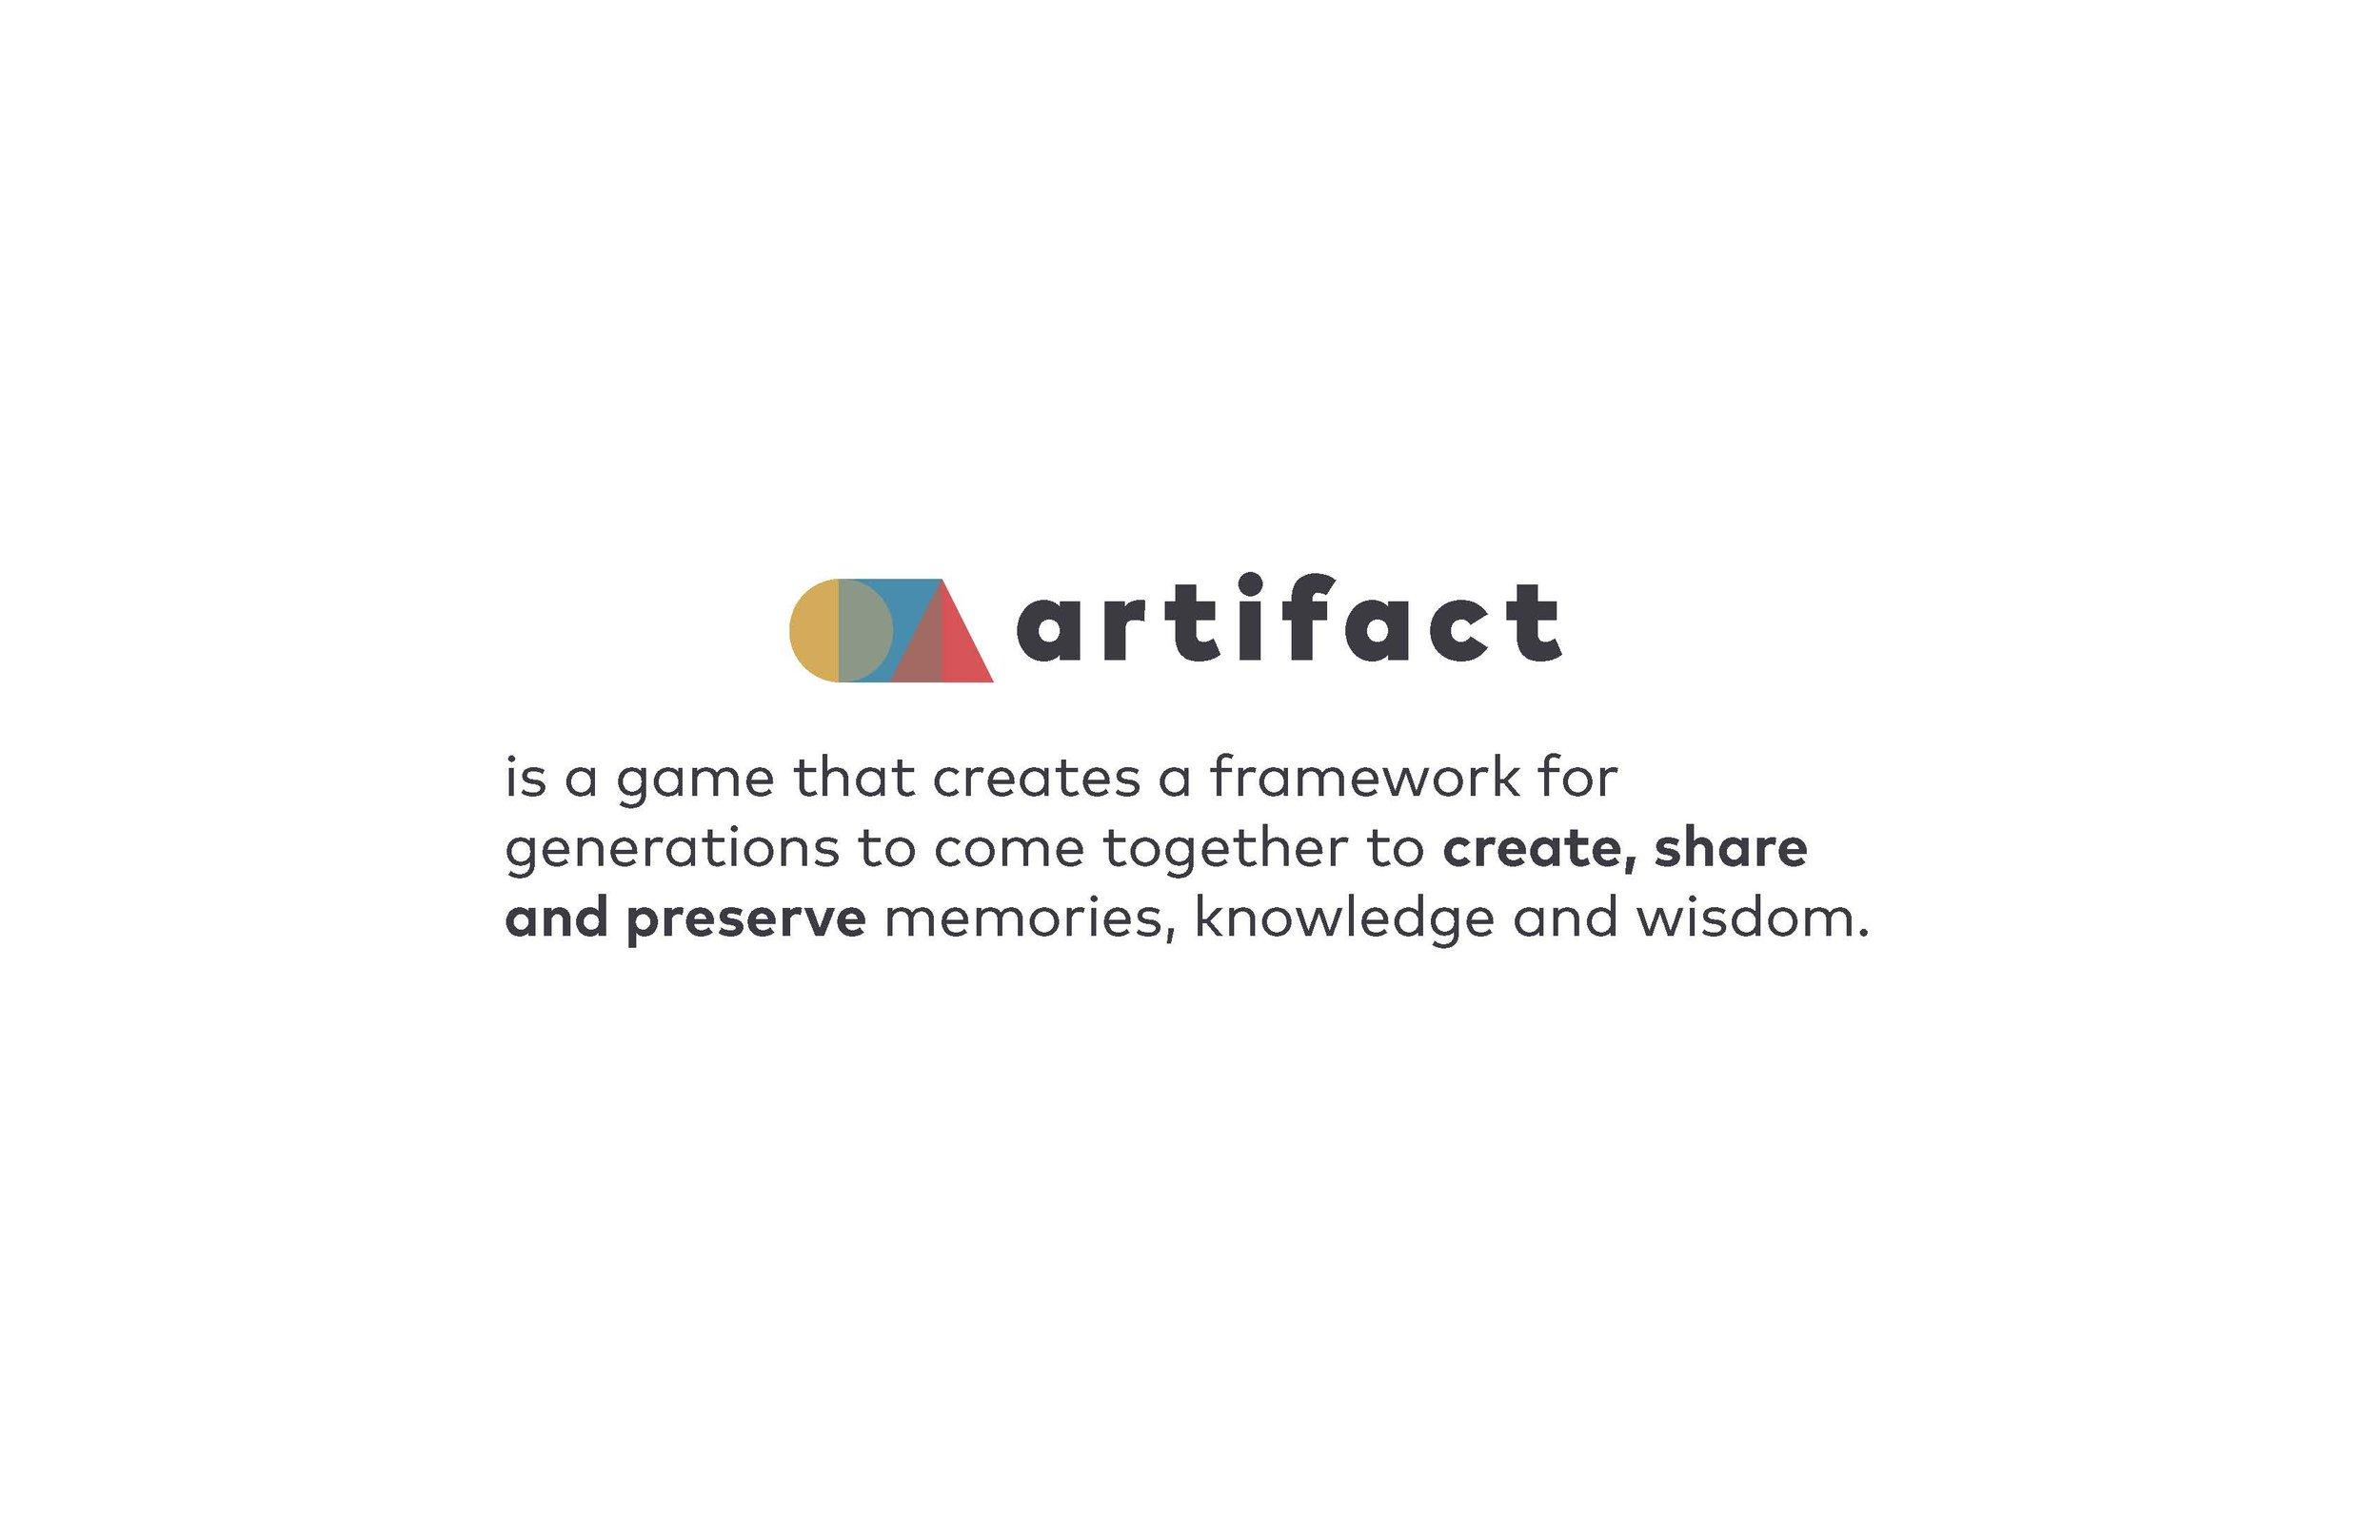 ArtifactFinalPresentation-1_Page_12.jpg